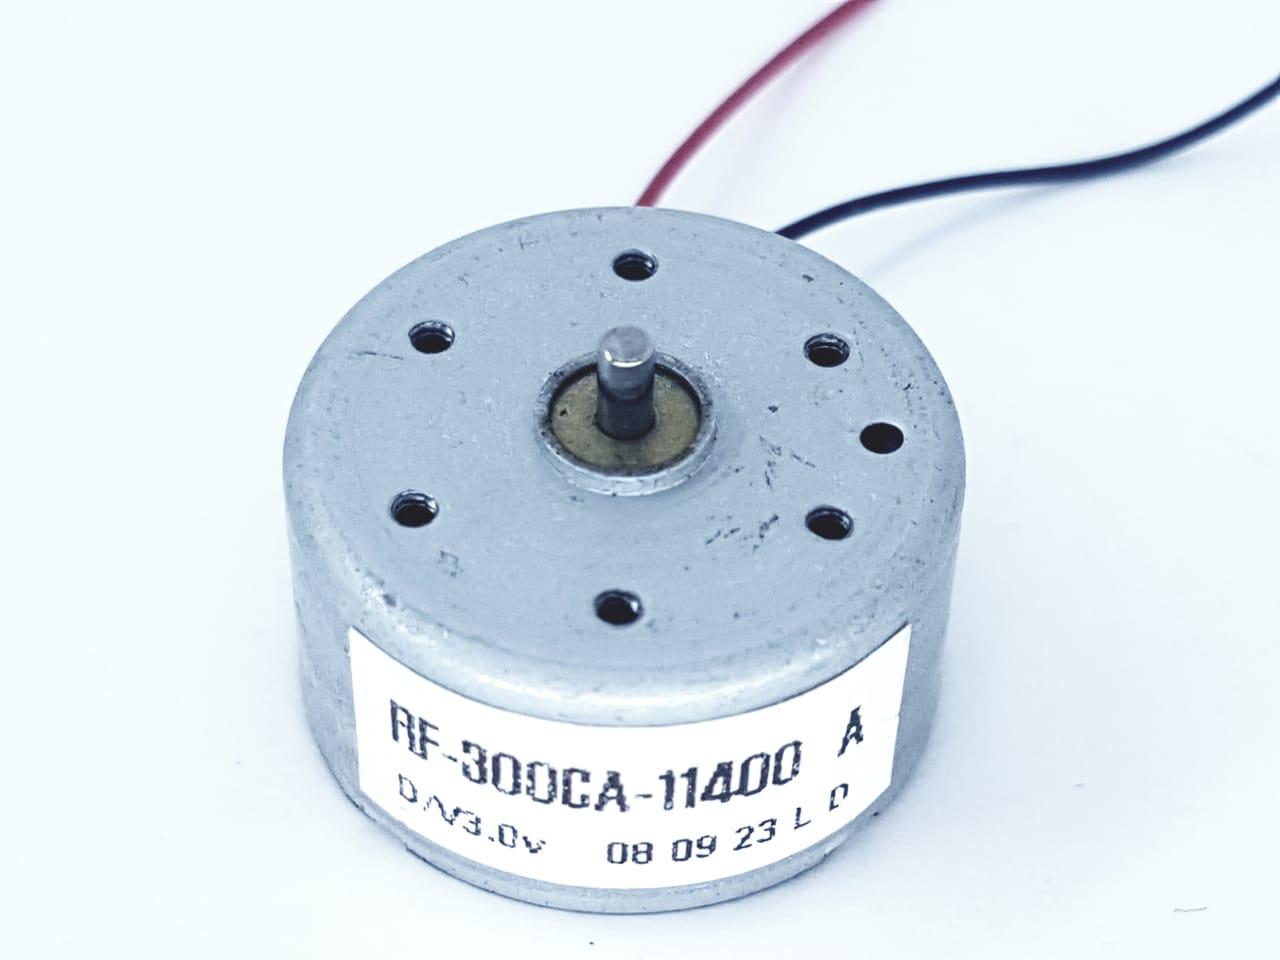 Motor Spindle Rf-300ca-11400 Novo